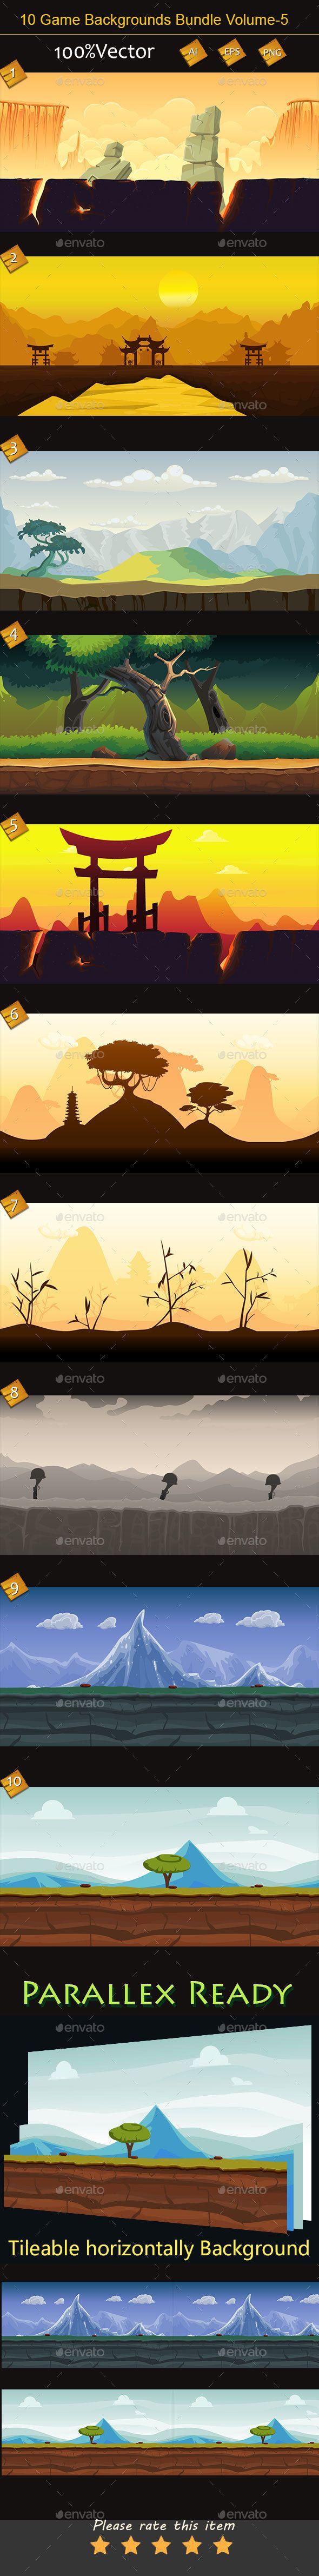 10 Game Backgrounds Bundle Volume 5 (Backgrounds)